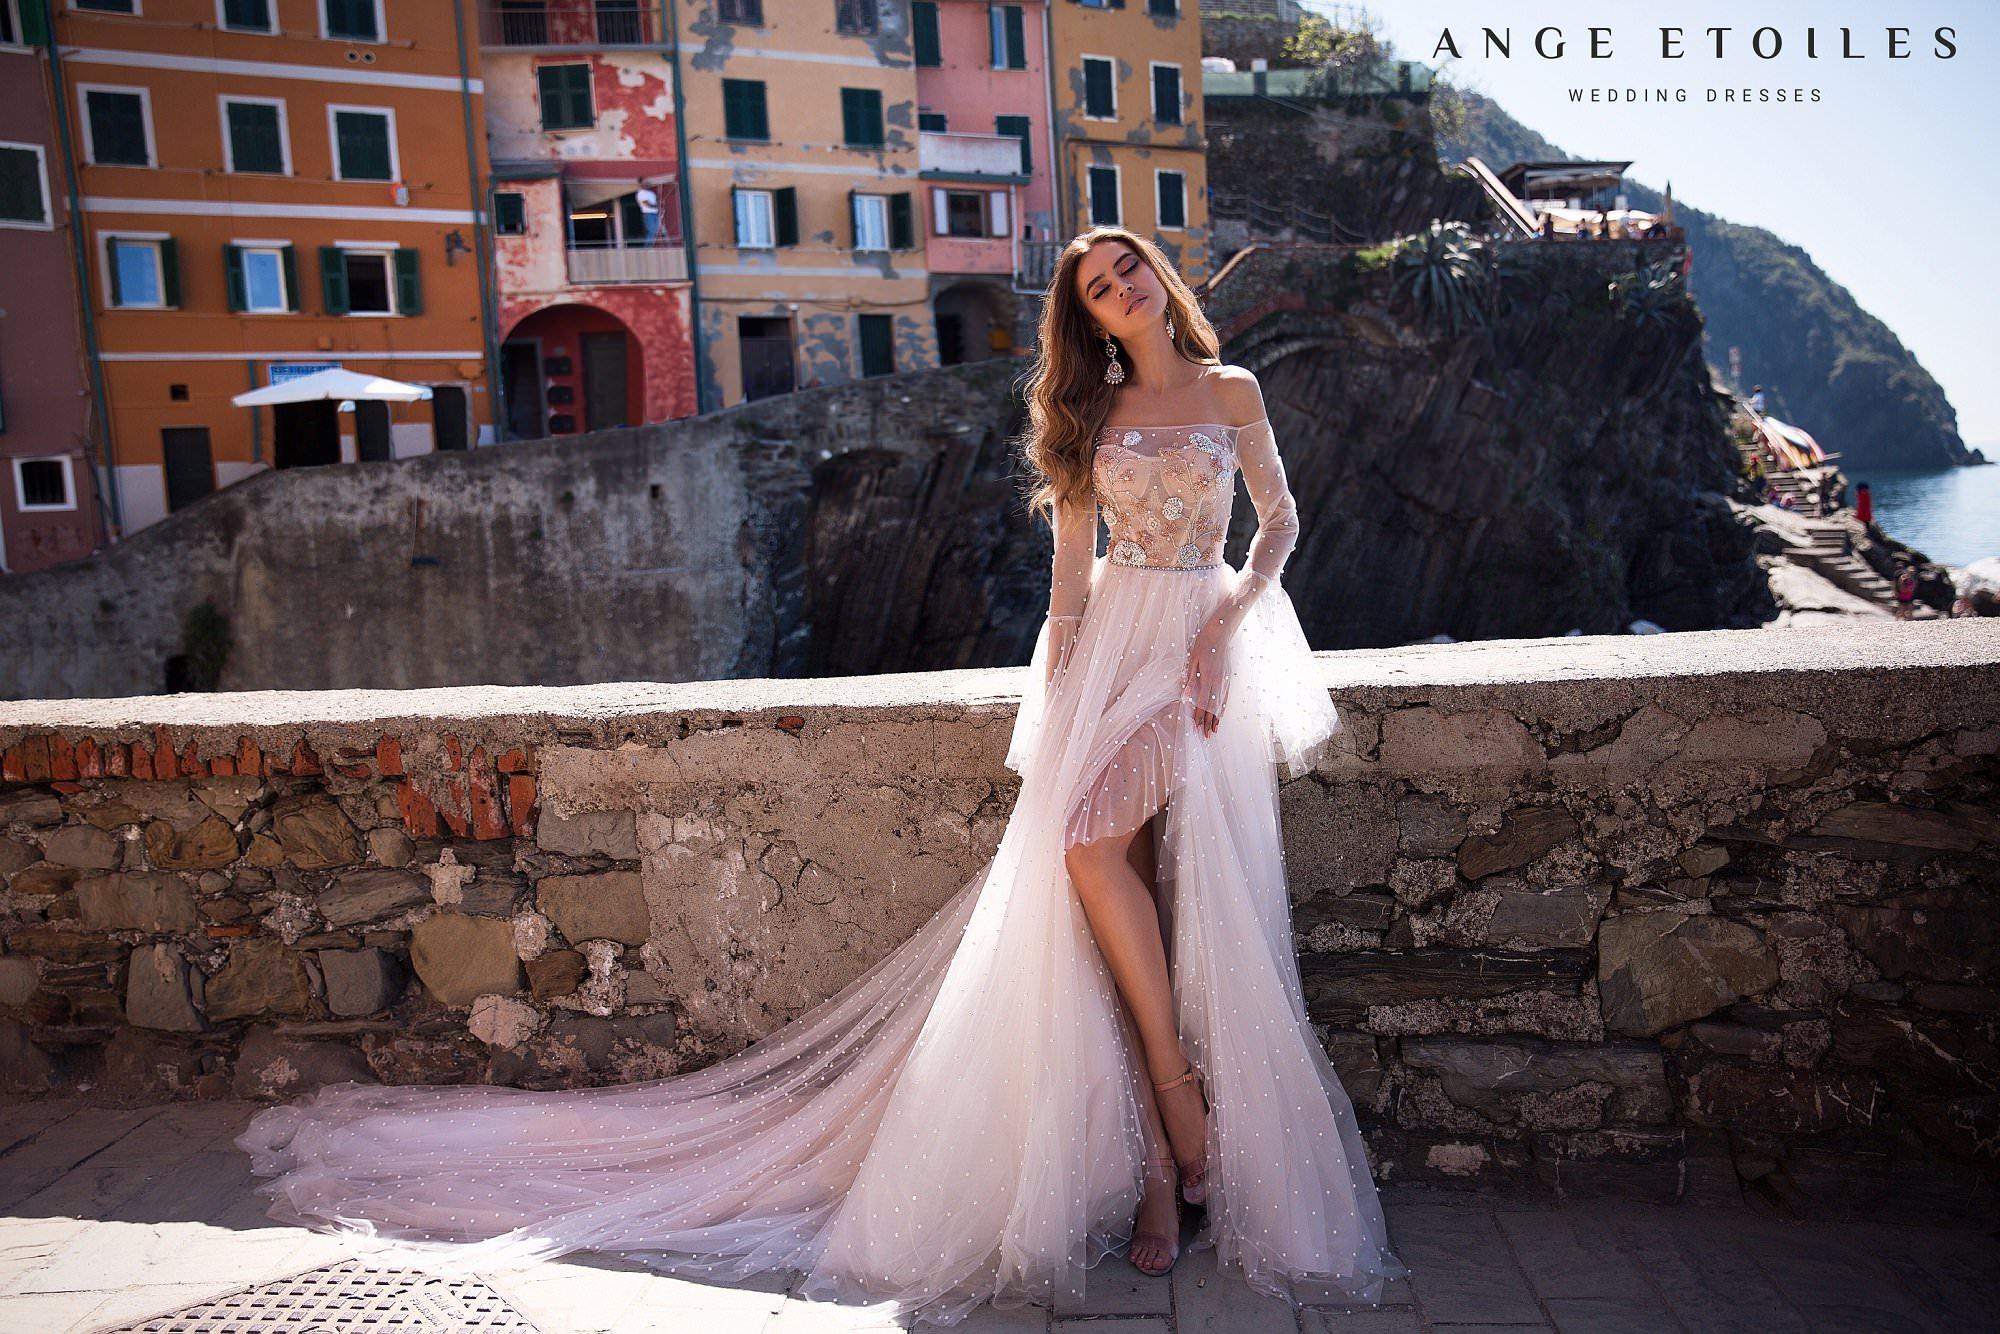 Ali D'Amore Ange Etoiles